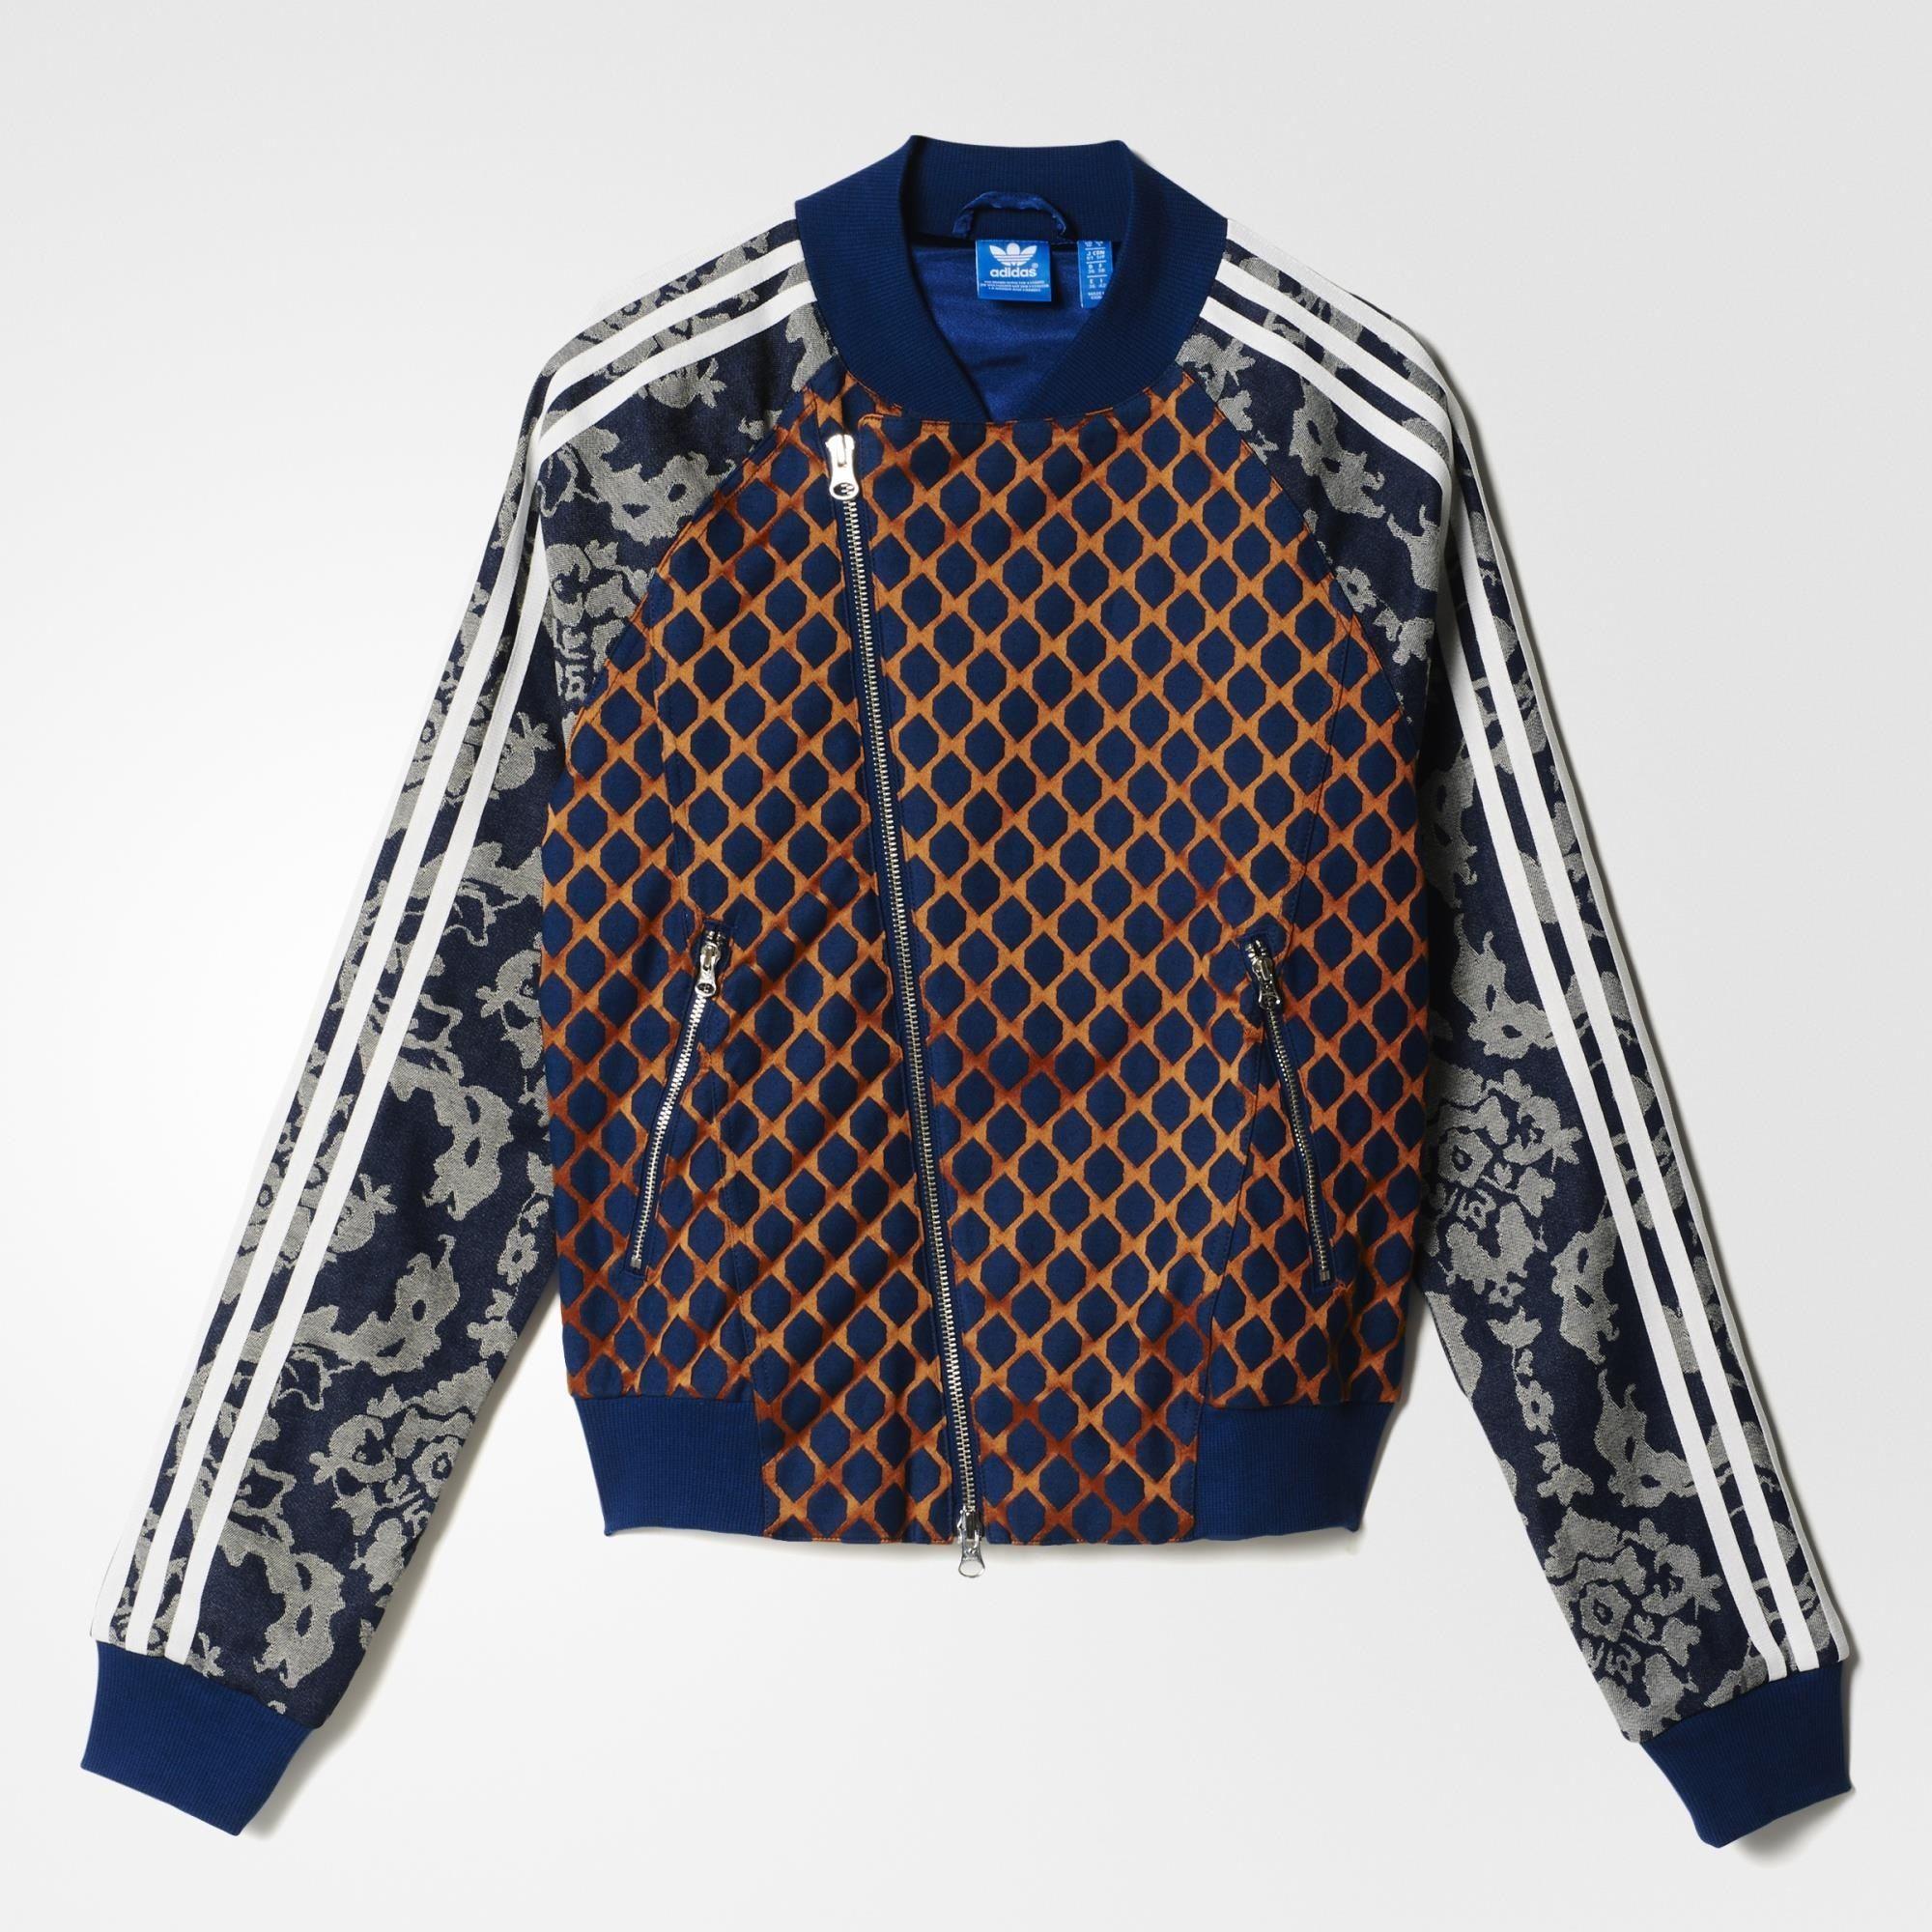 7d72eef18c0c adidas Superstar Track Jacket Paris - Blue